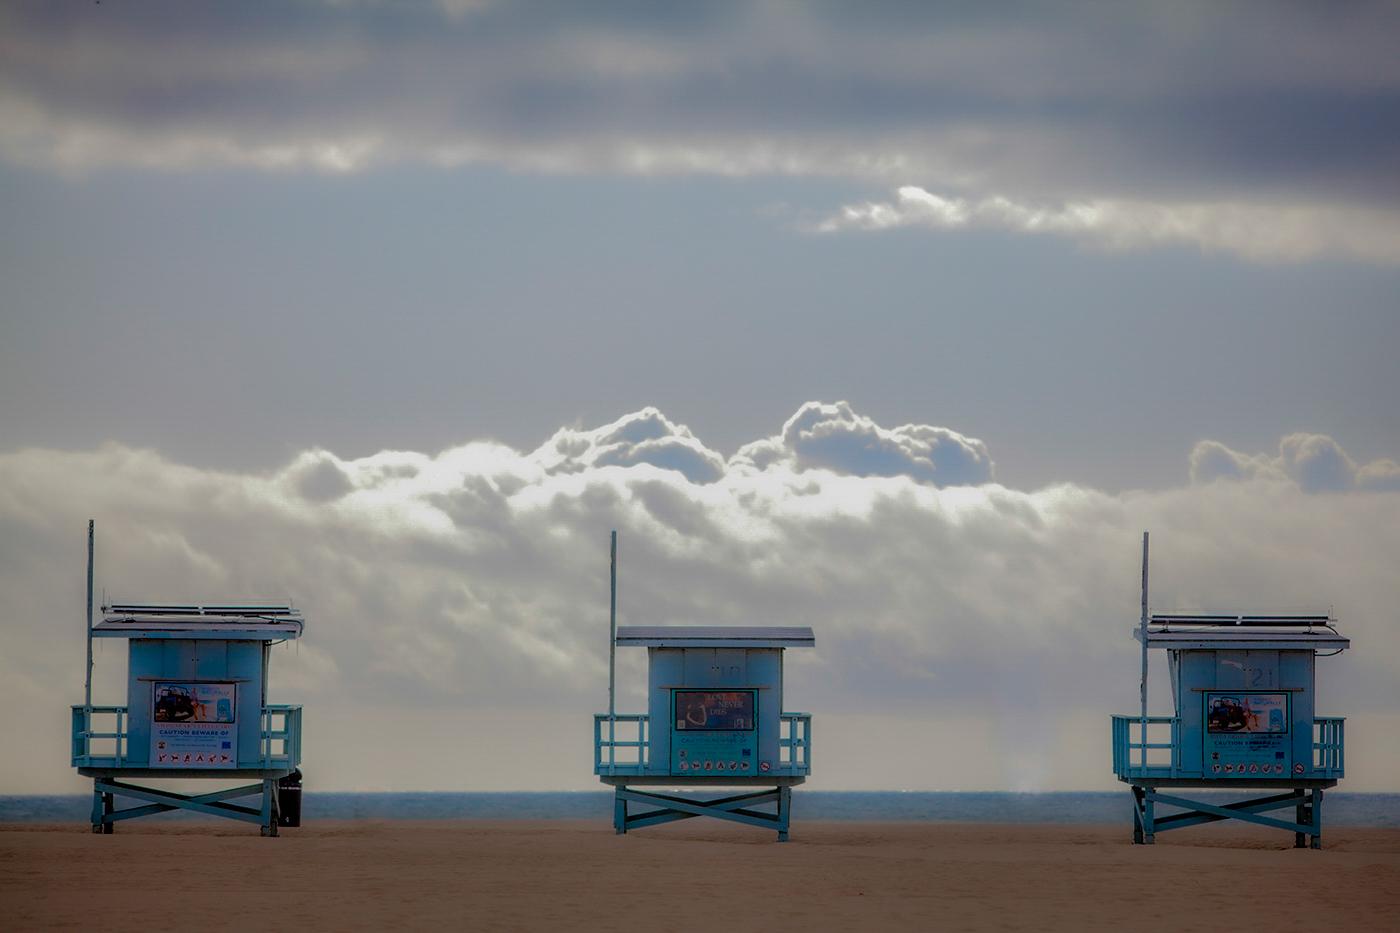 08Larry_White_1_Venice_Beach_Lifeguard_Shacks